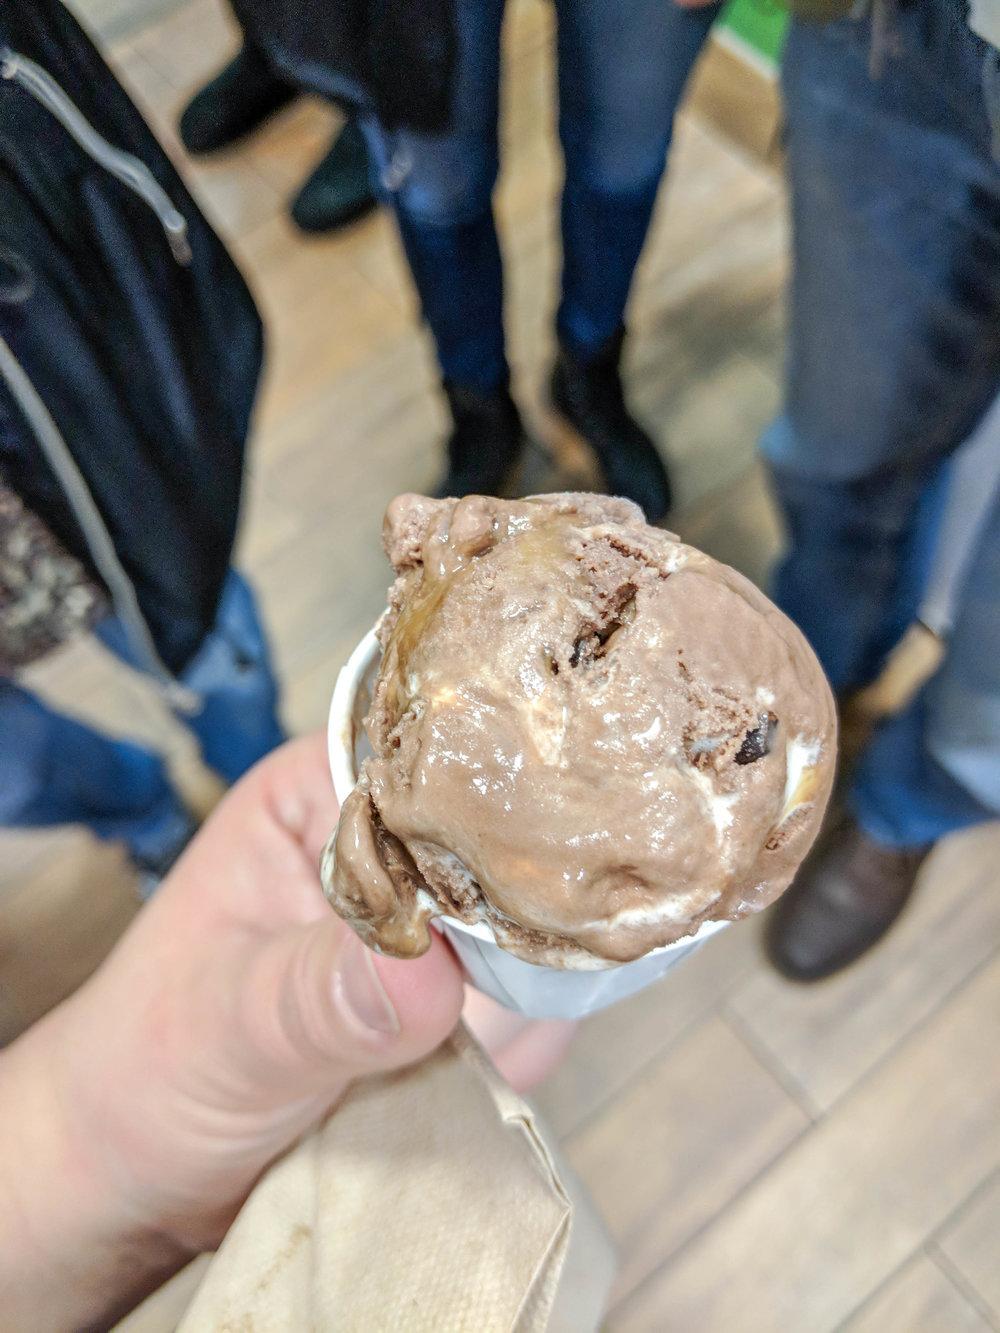 bri rinehart; ben and jerry's factory; tour; ice cream